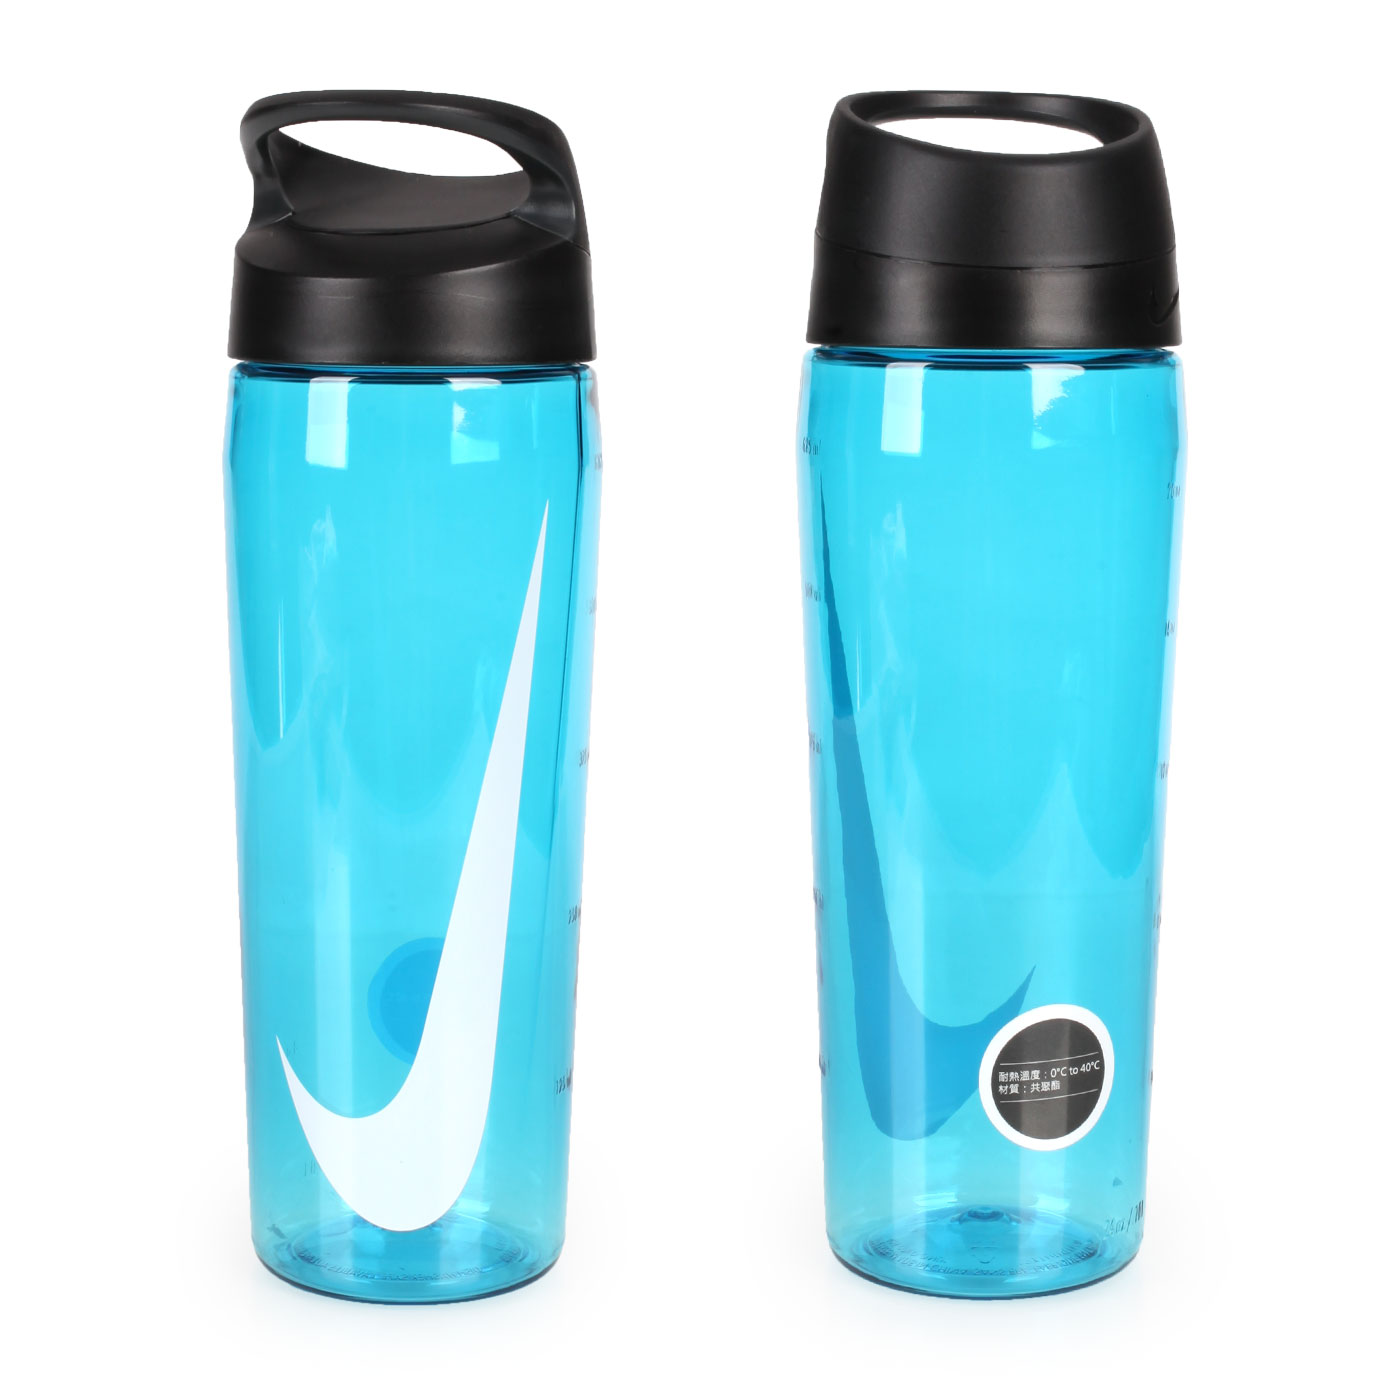 NIKE 旋蓋式水壺 24OZ N000320743024 - 透明藍白